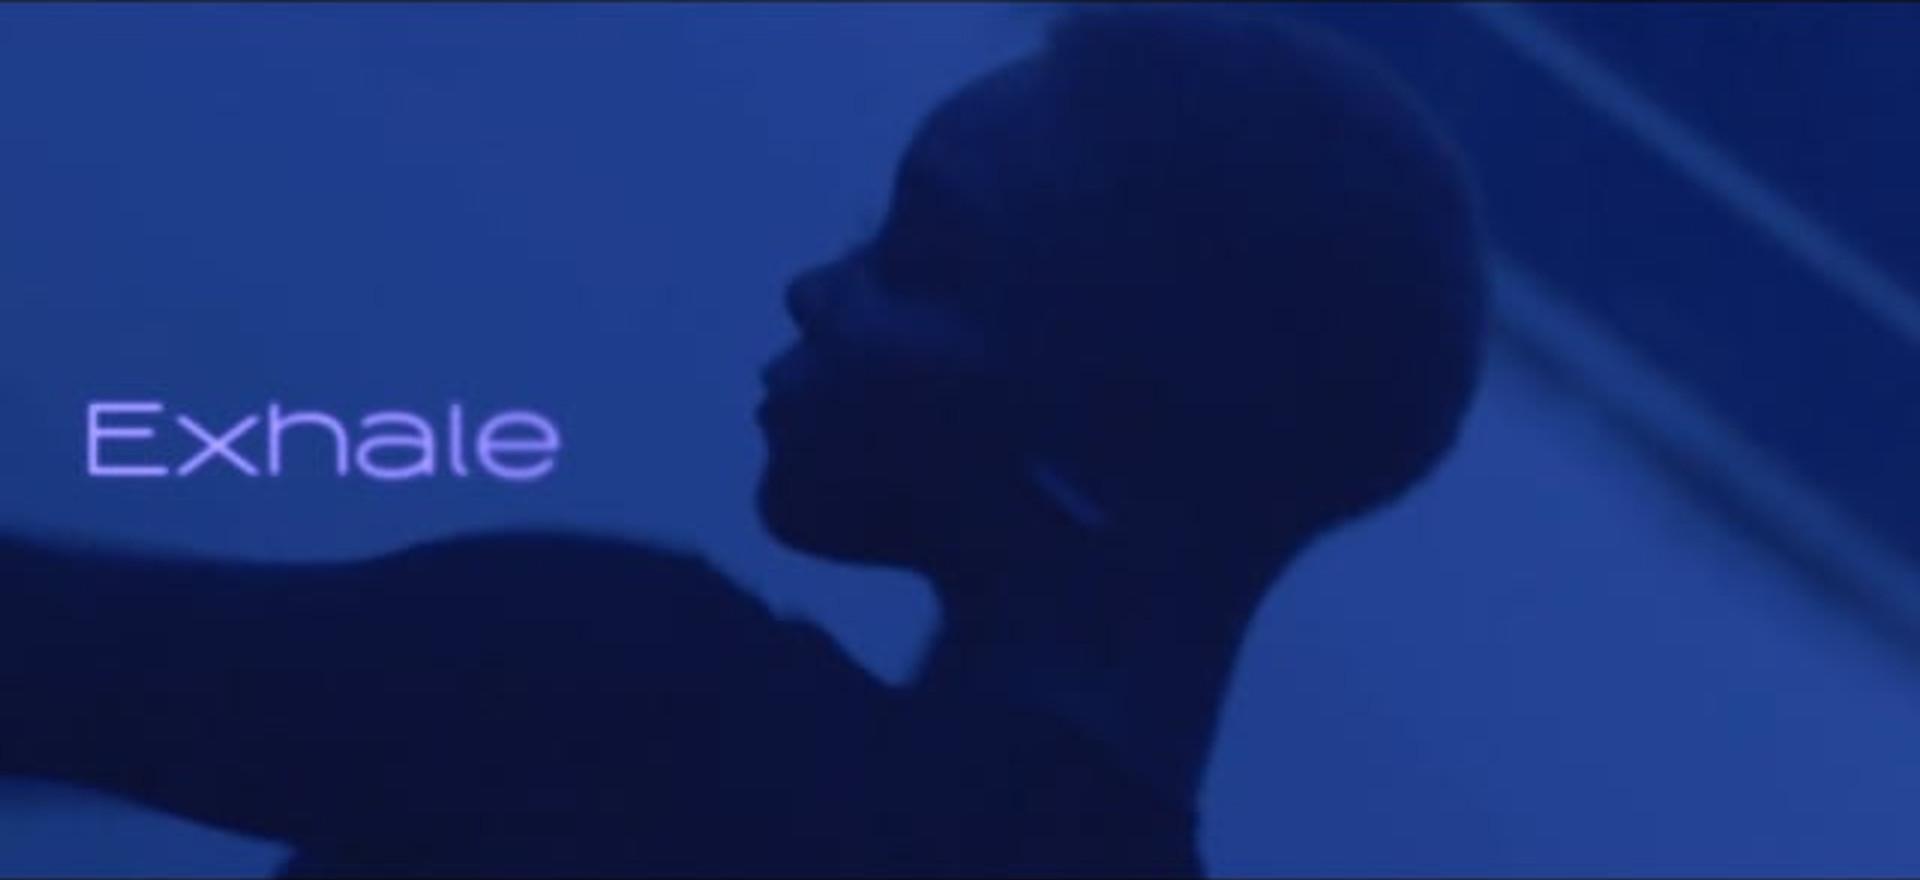 Exhale-SMOO